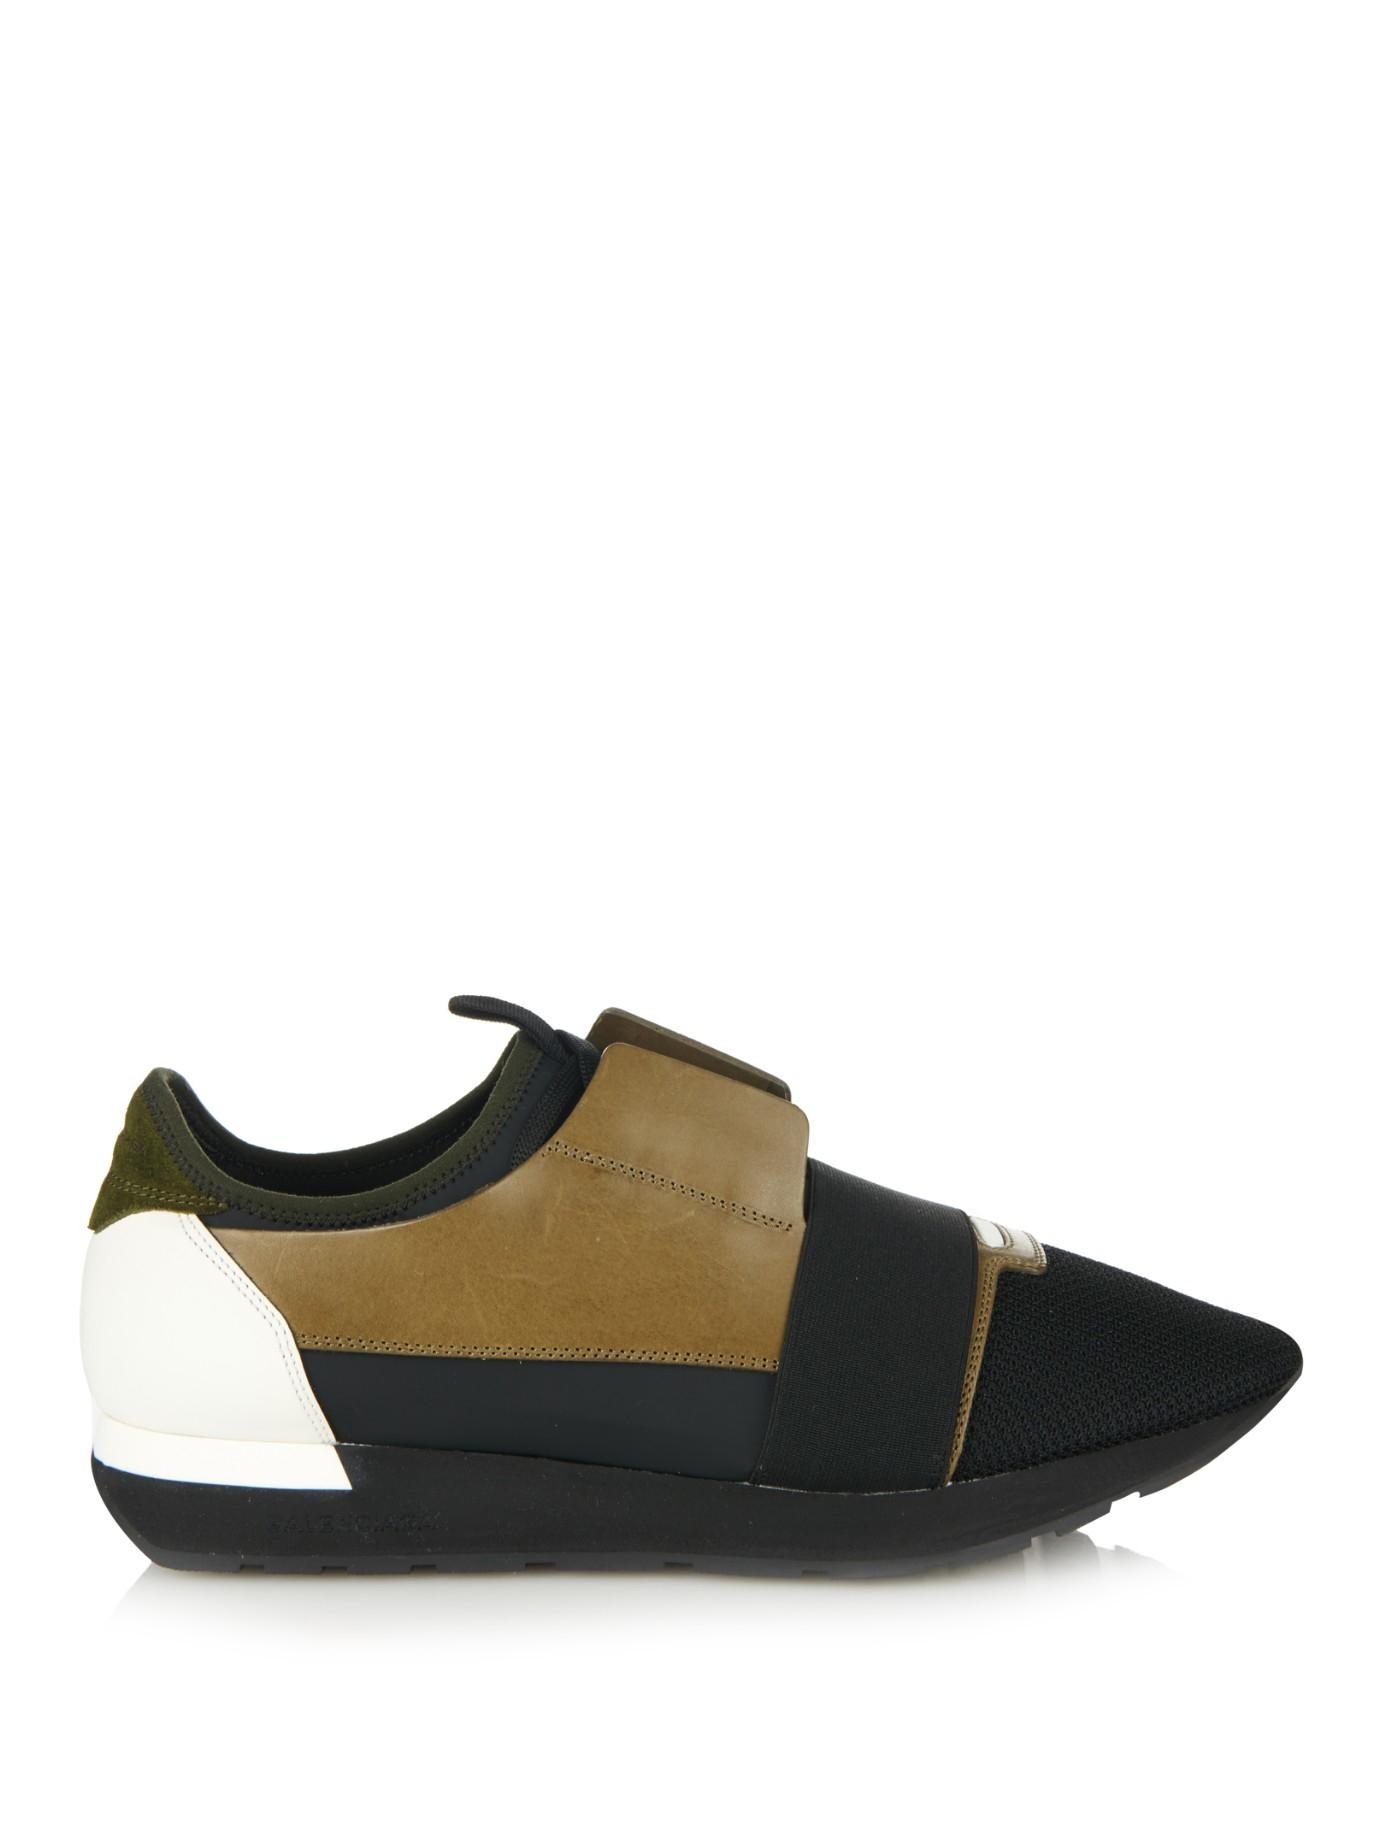 Asos Mens Shoes